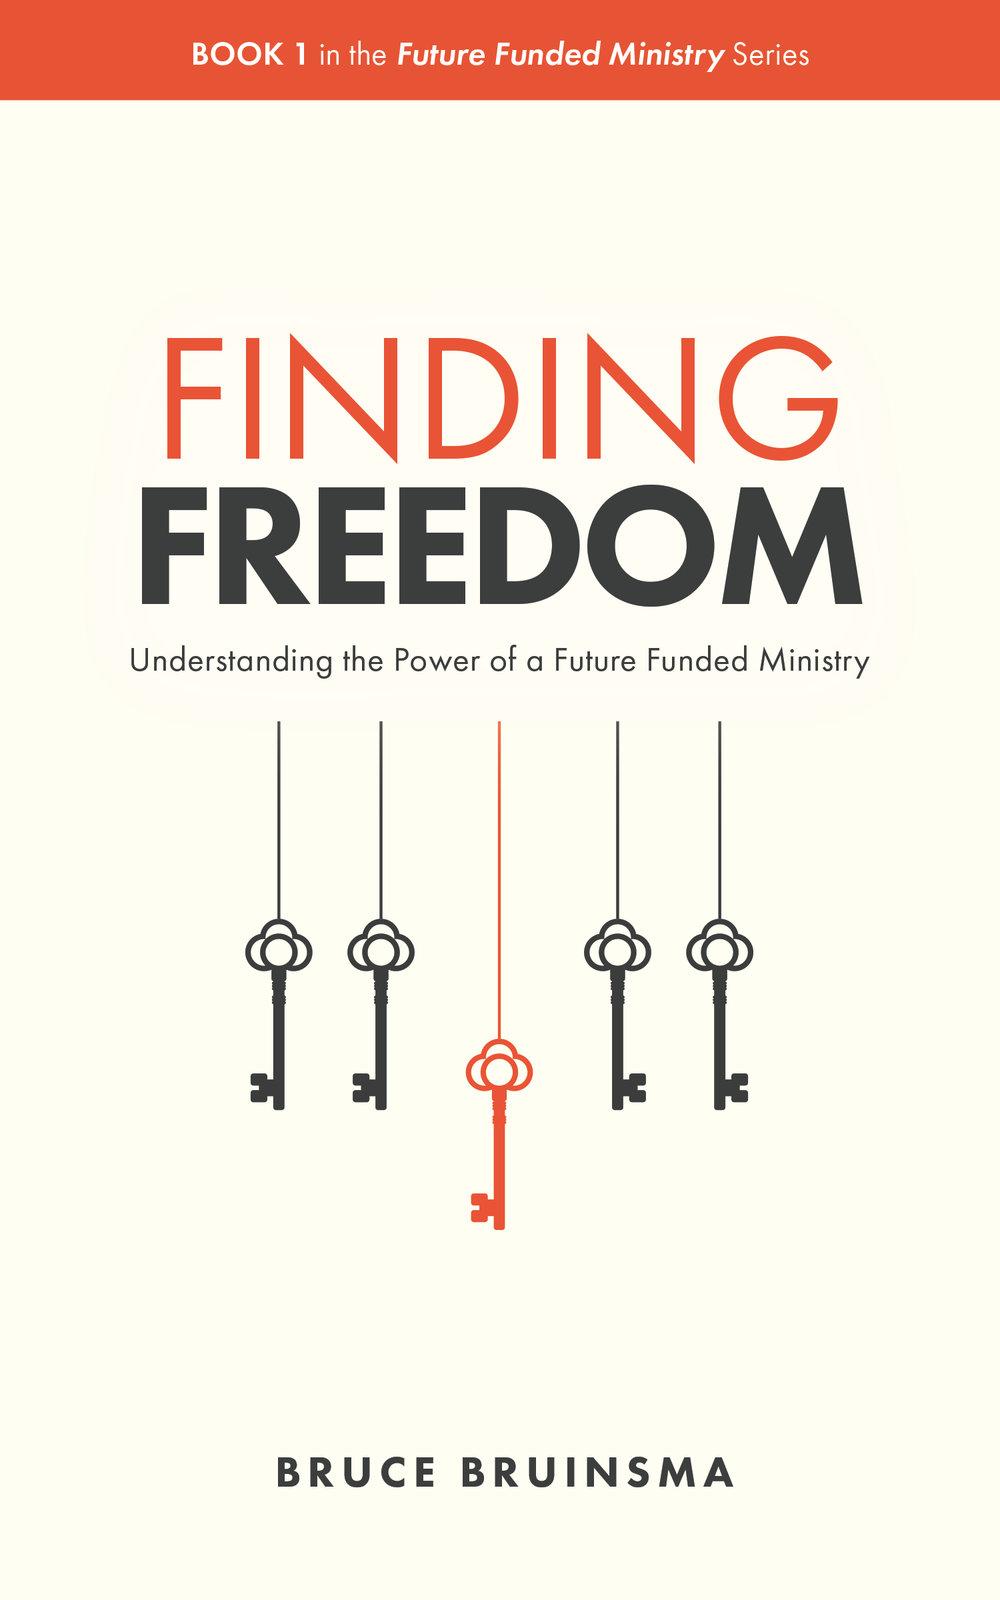 2018-bruce-bruinsma-finding-freedom-kindle-cover.jpg